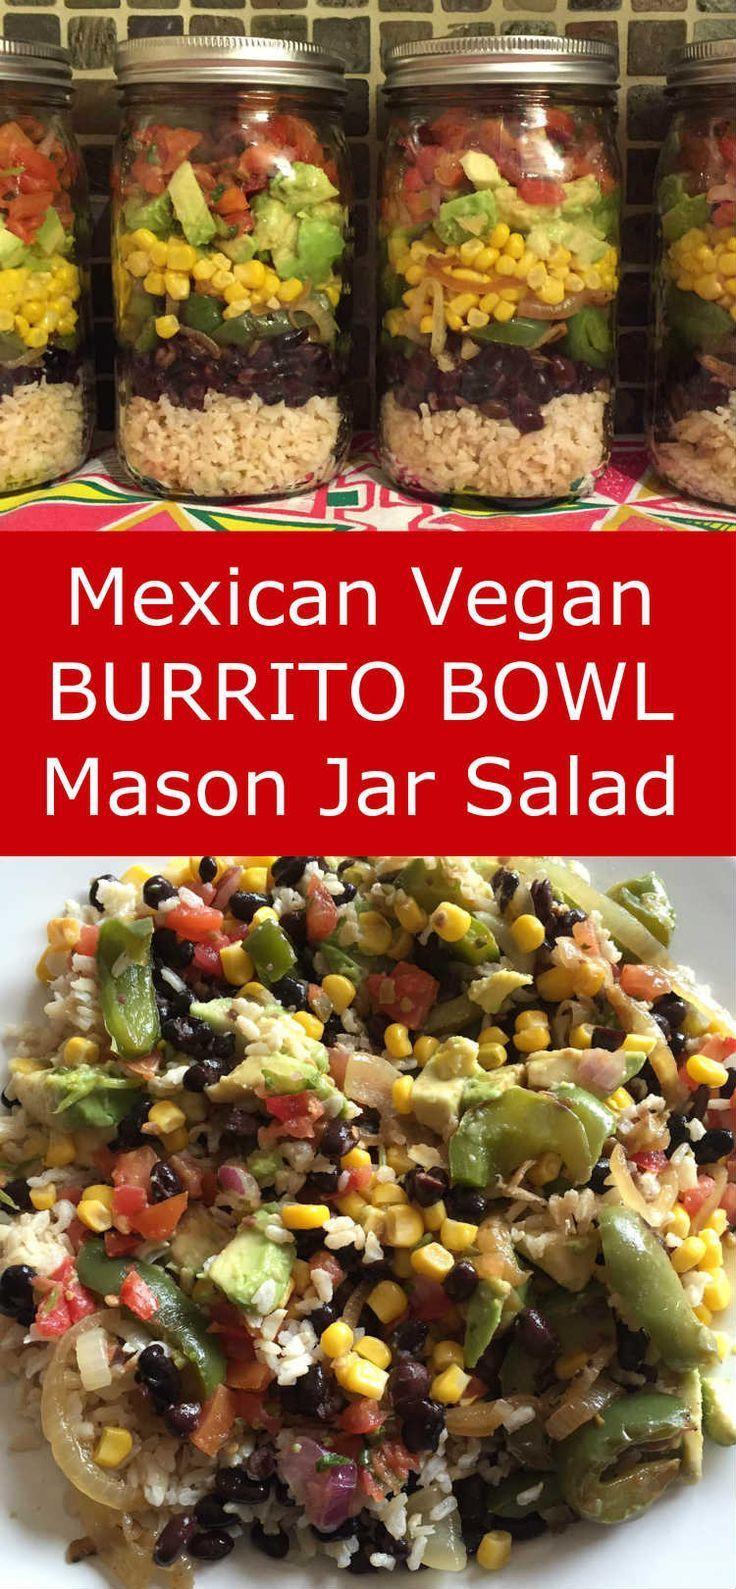 Mexican Vegan Burrito Bowl Mason Jar Salad Recipe - Chipotle Style! | http://MelanieCooks.com